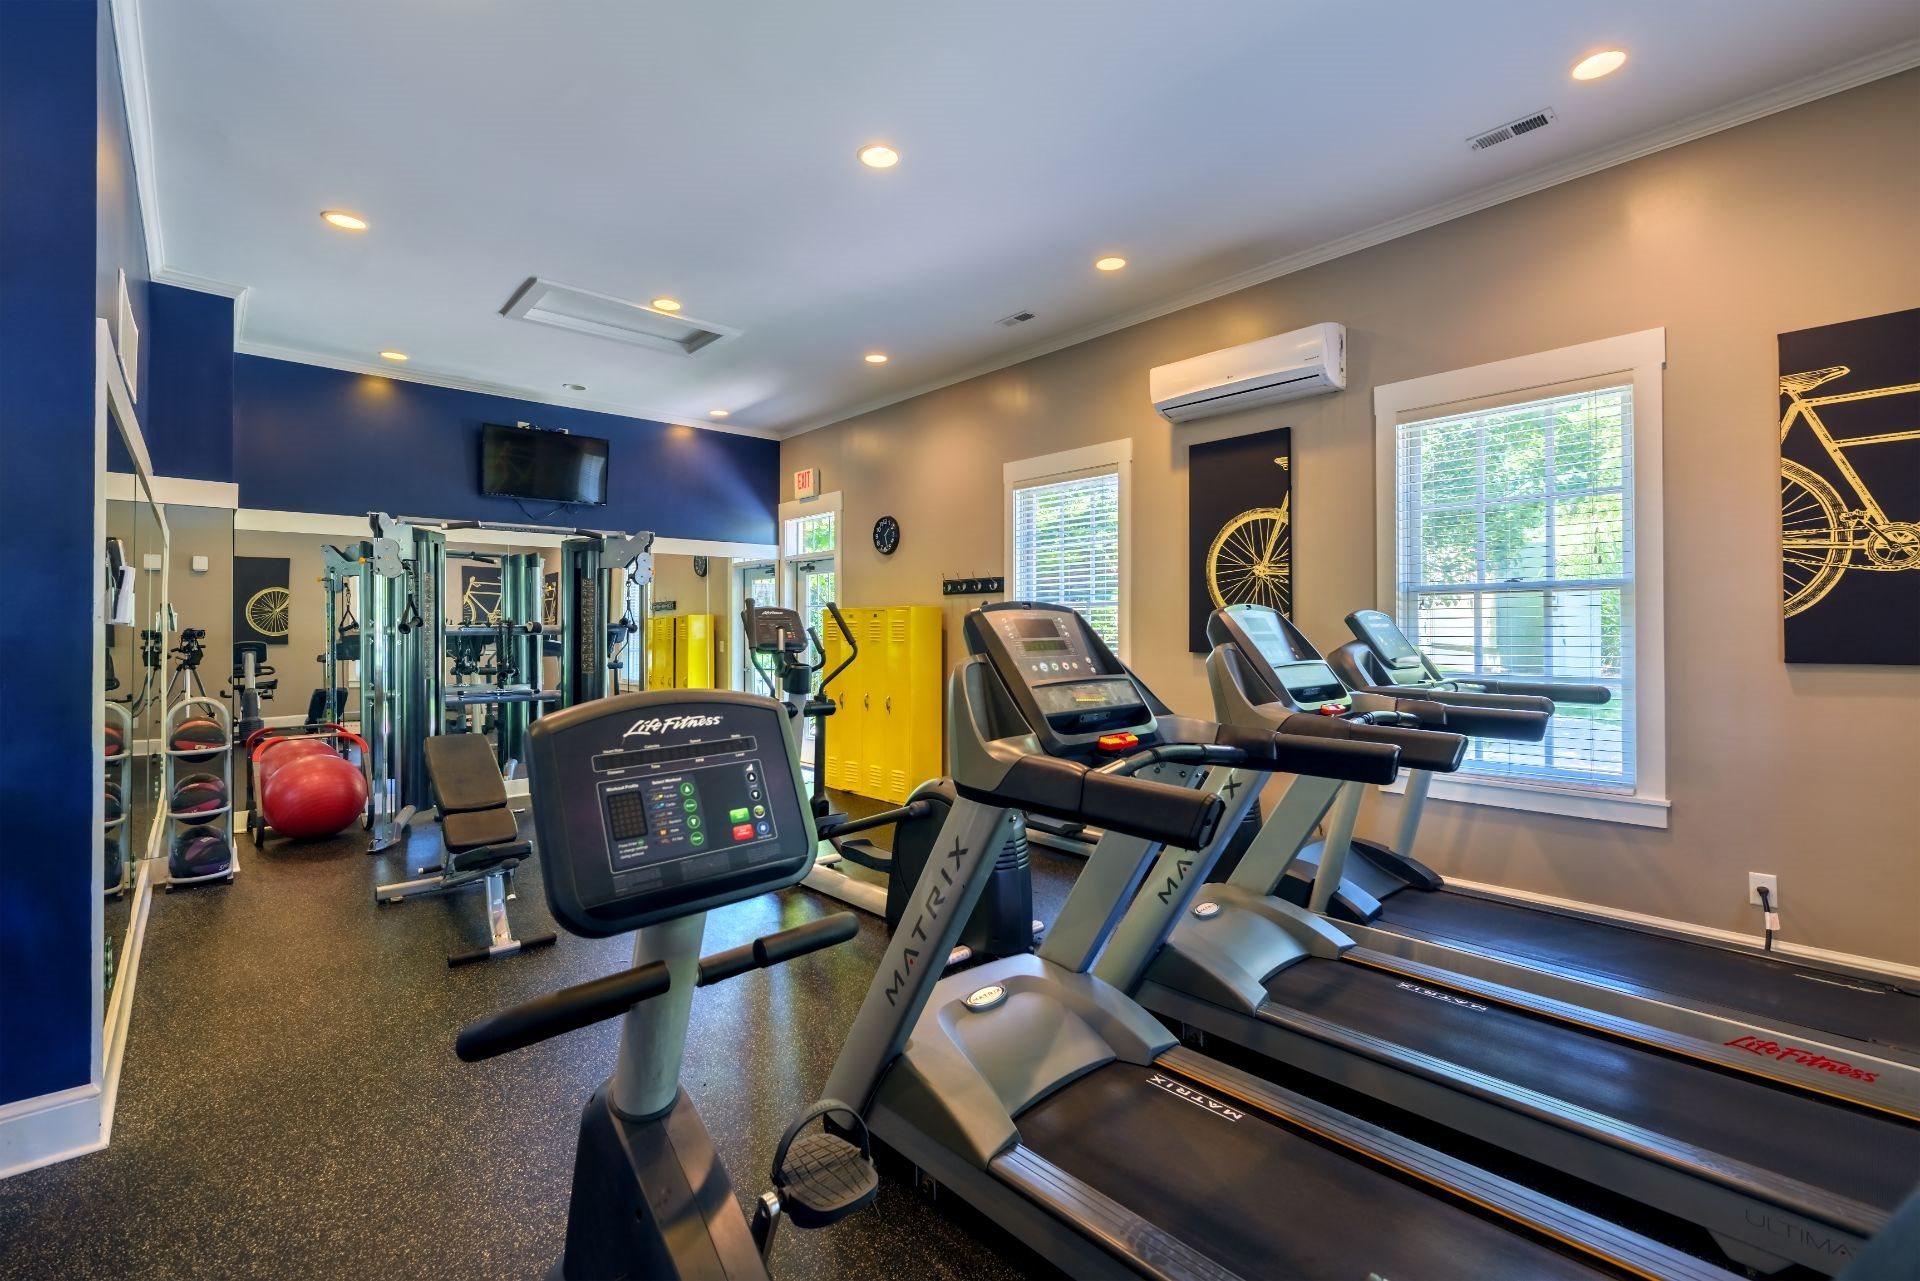 Christopher Wren Apartments, 501 Christopher Wren Drive, Wexford, PA 15090 Fitness Center